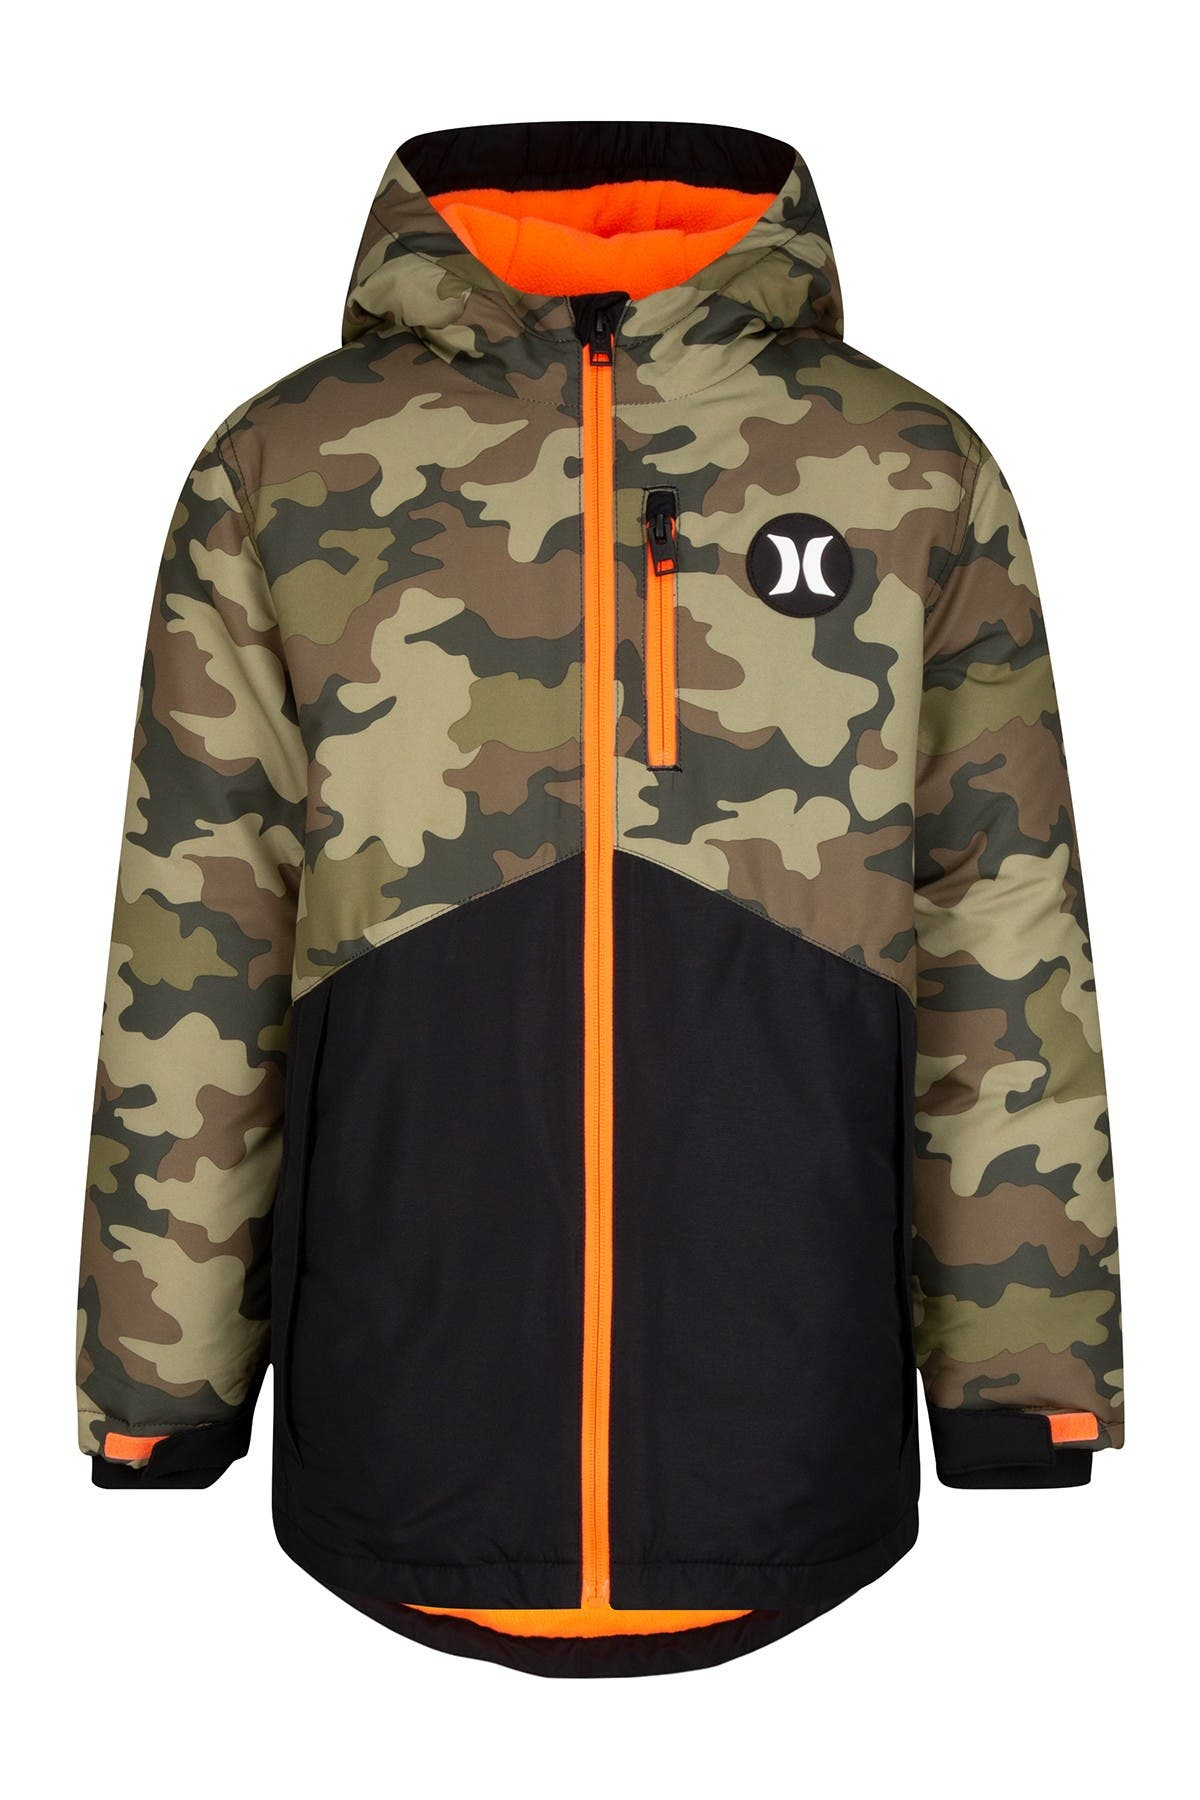 Image of Hurley Snowboard Jacket